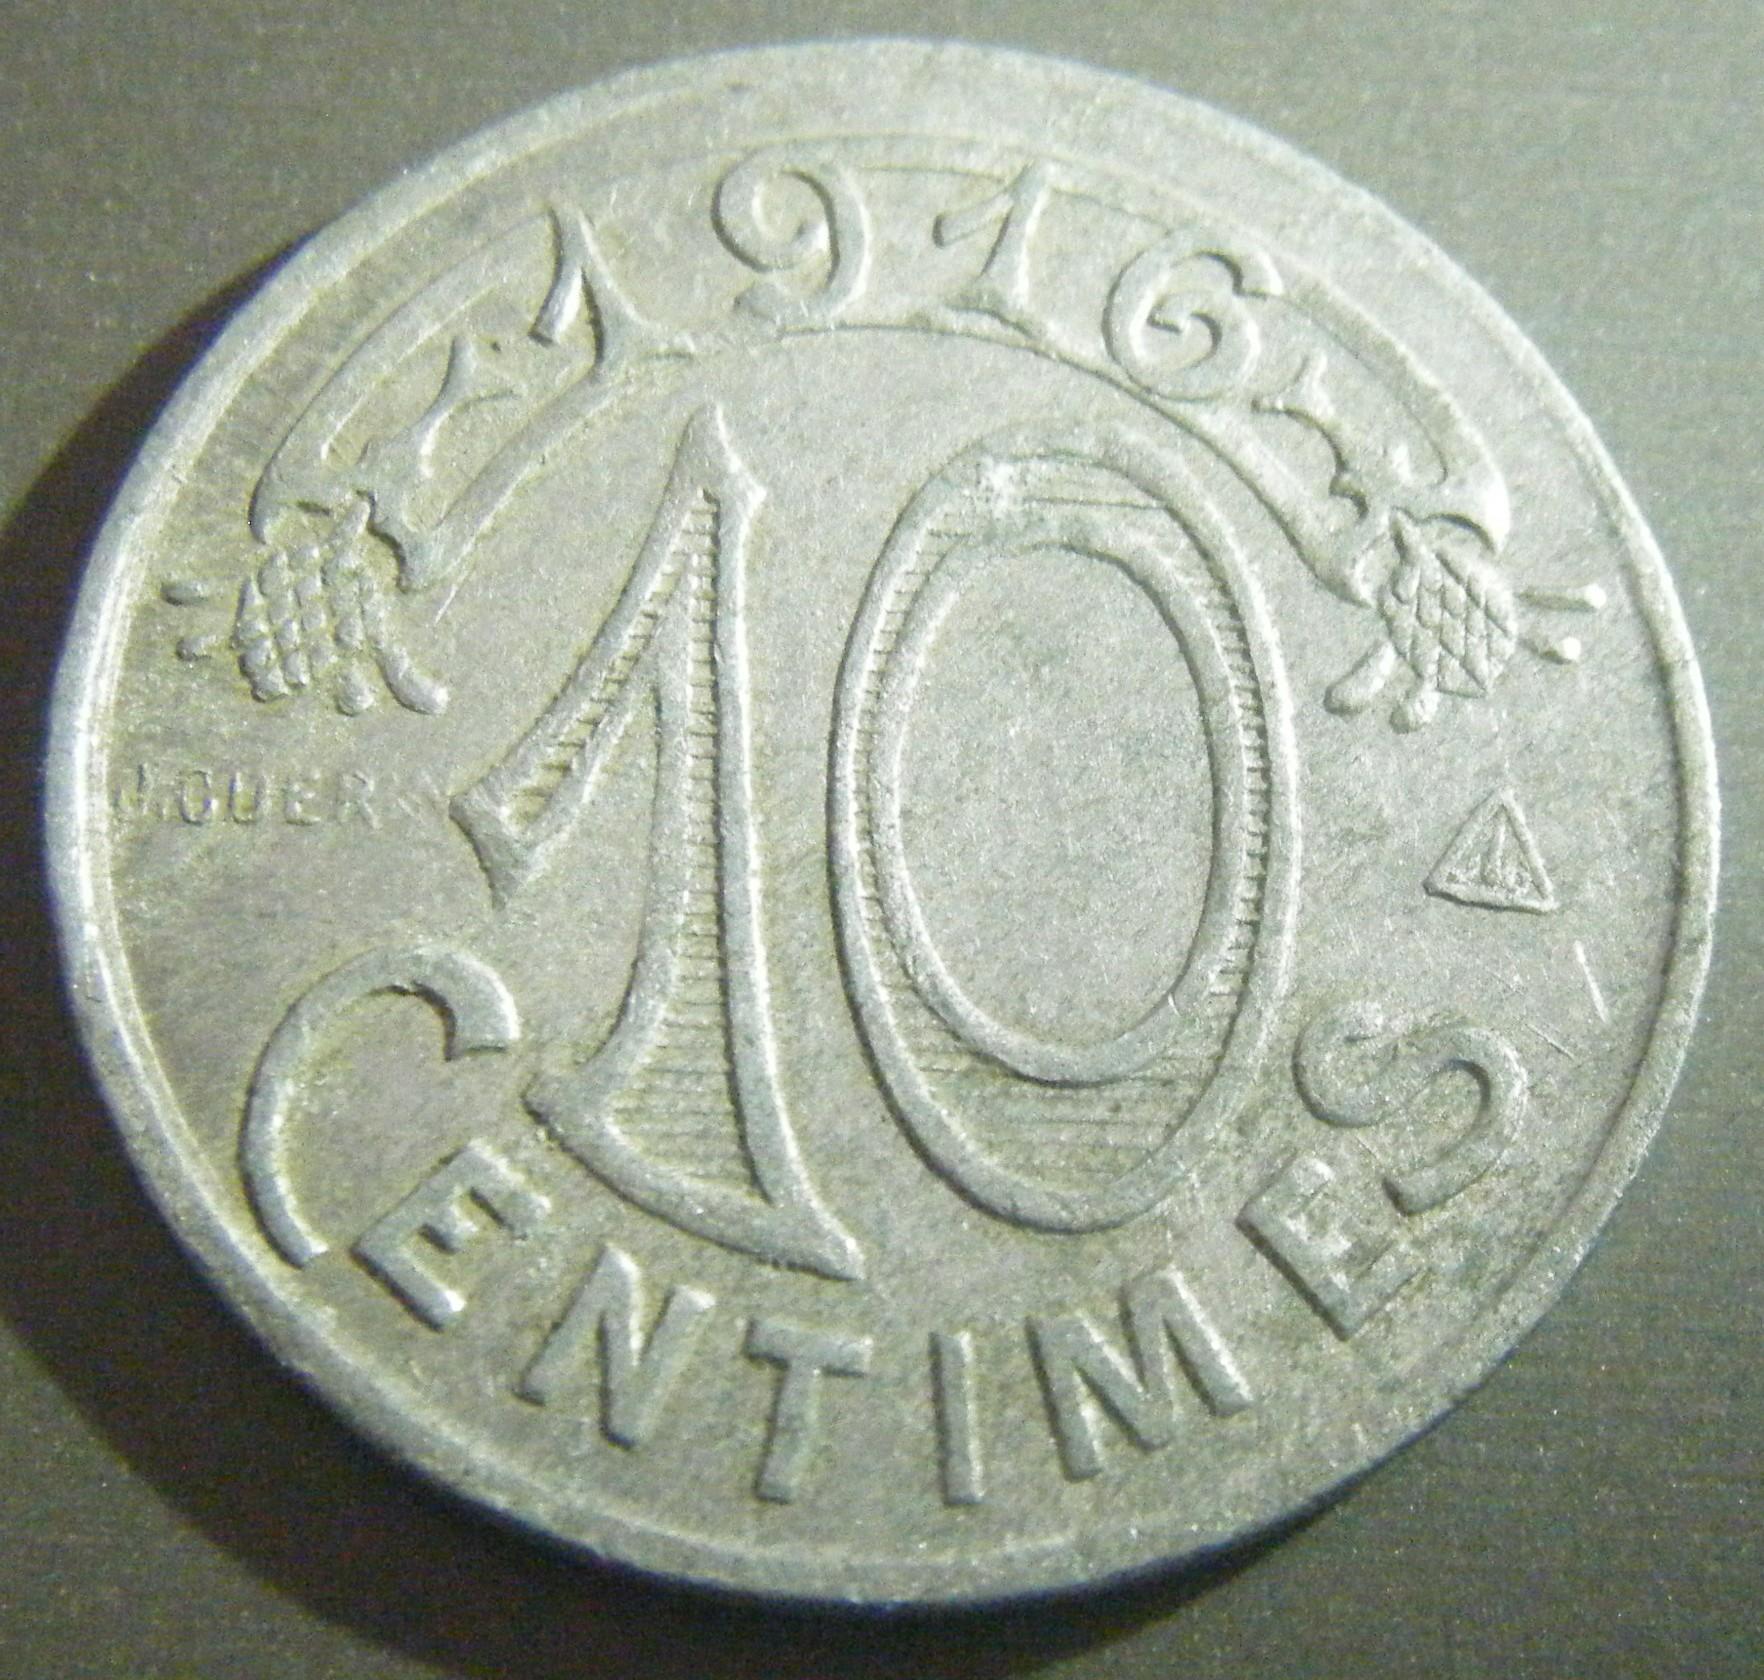 R solu 10 centimes chambre de commerce marseille vari t numista - Chambre des commerce marseille ...